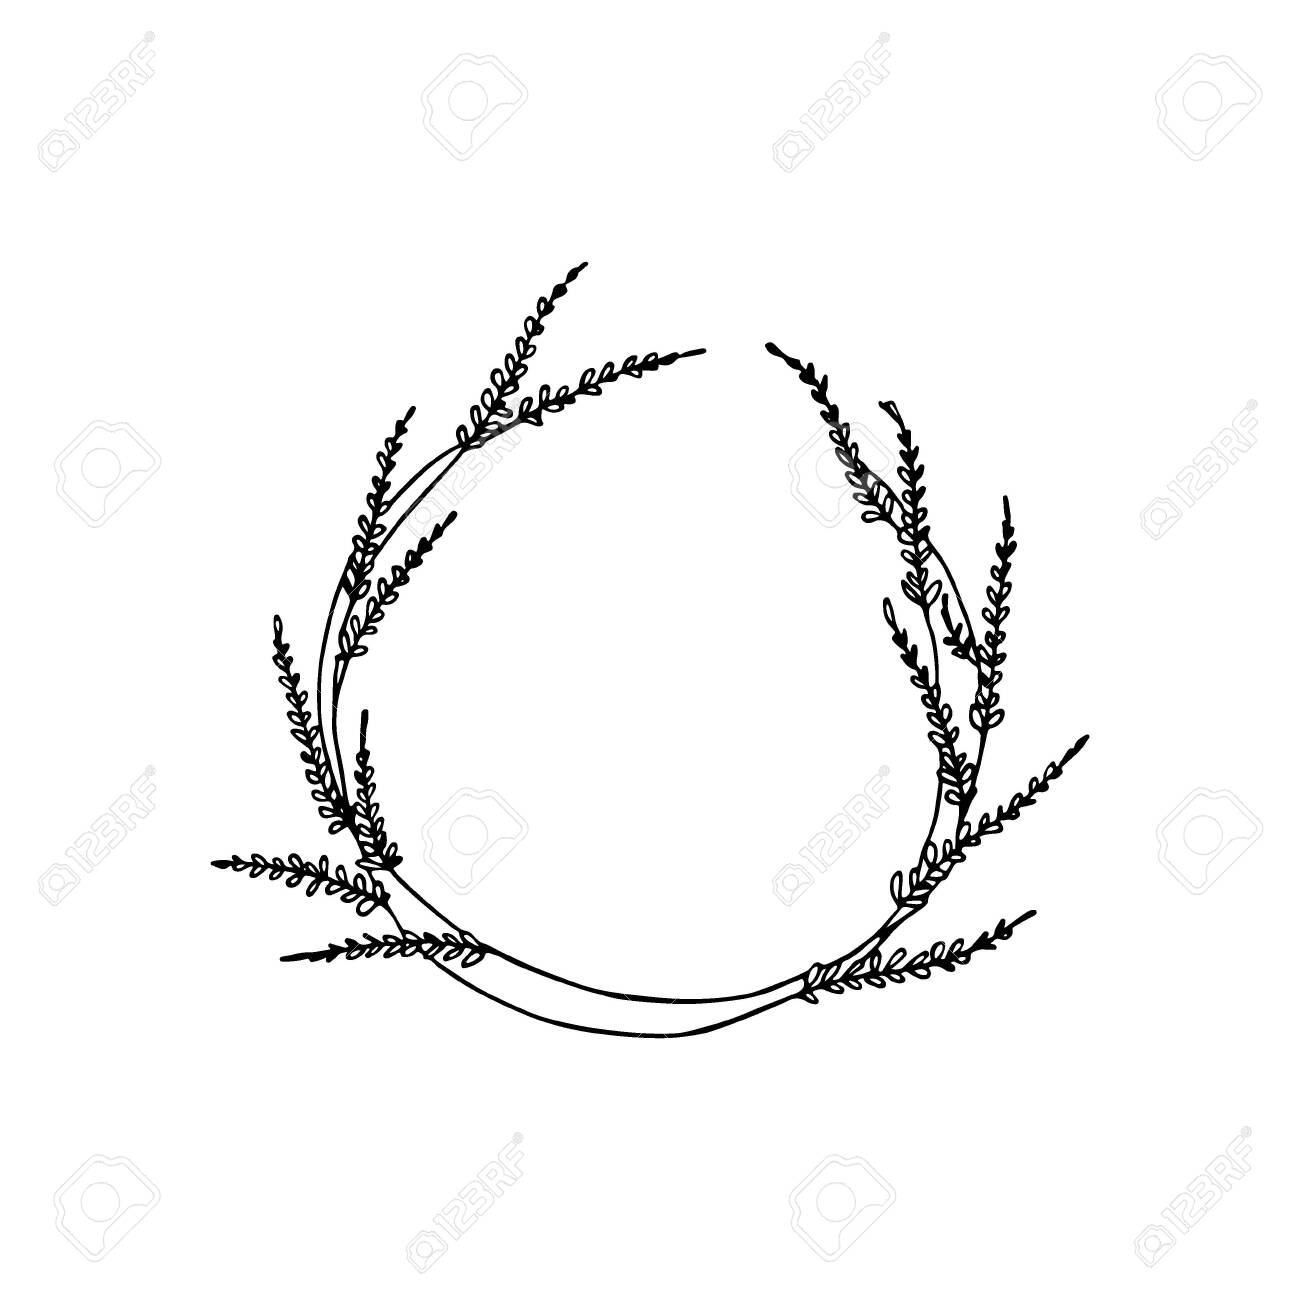 Hand drawn floral wreath - 136320248